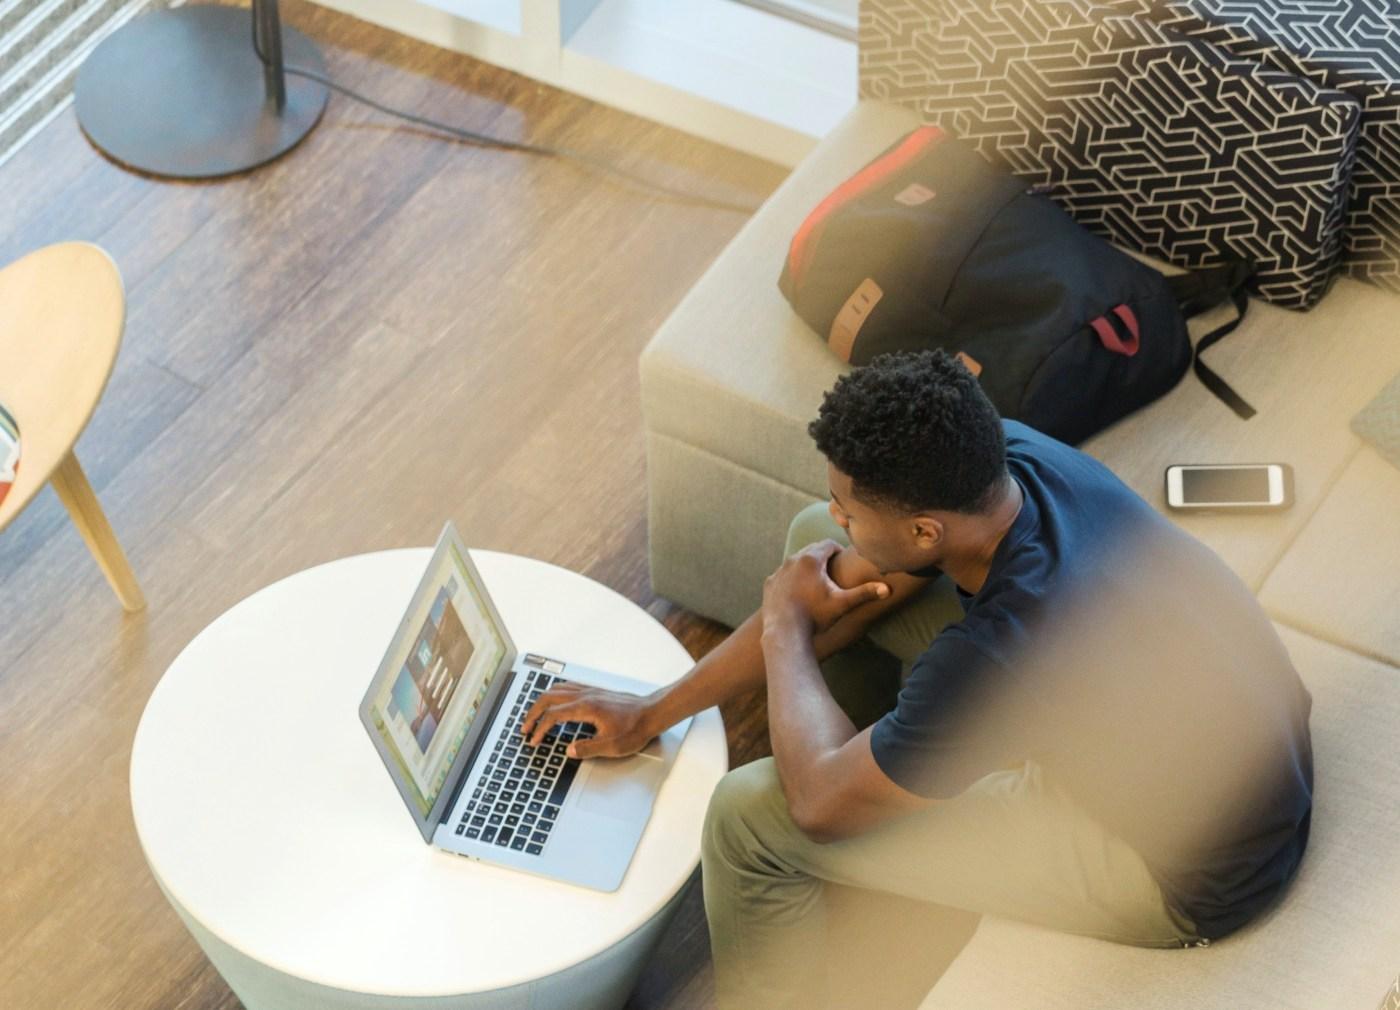 image of black man on computer